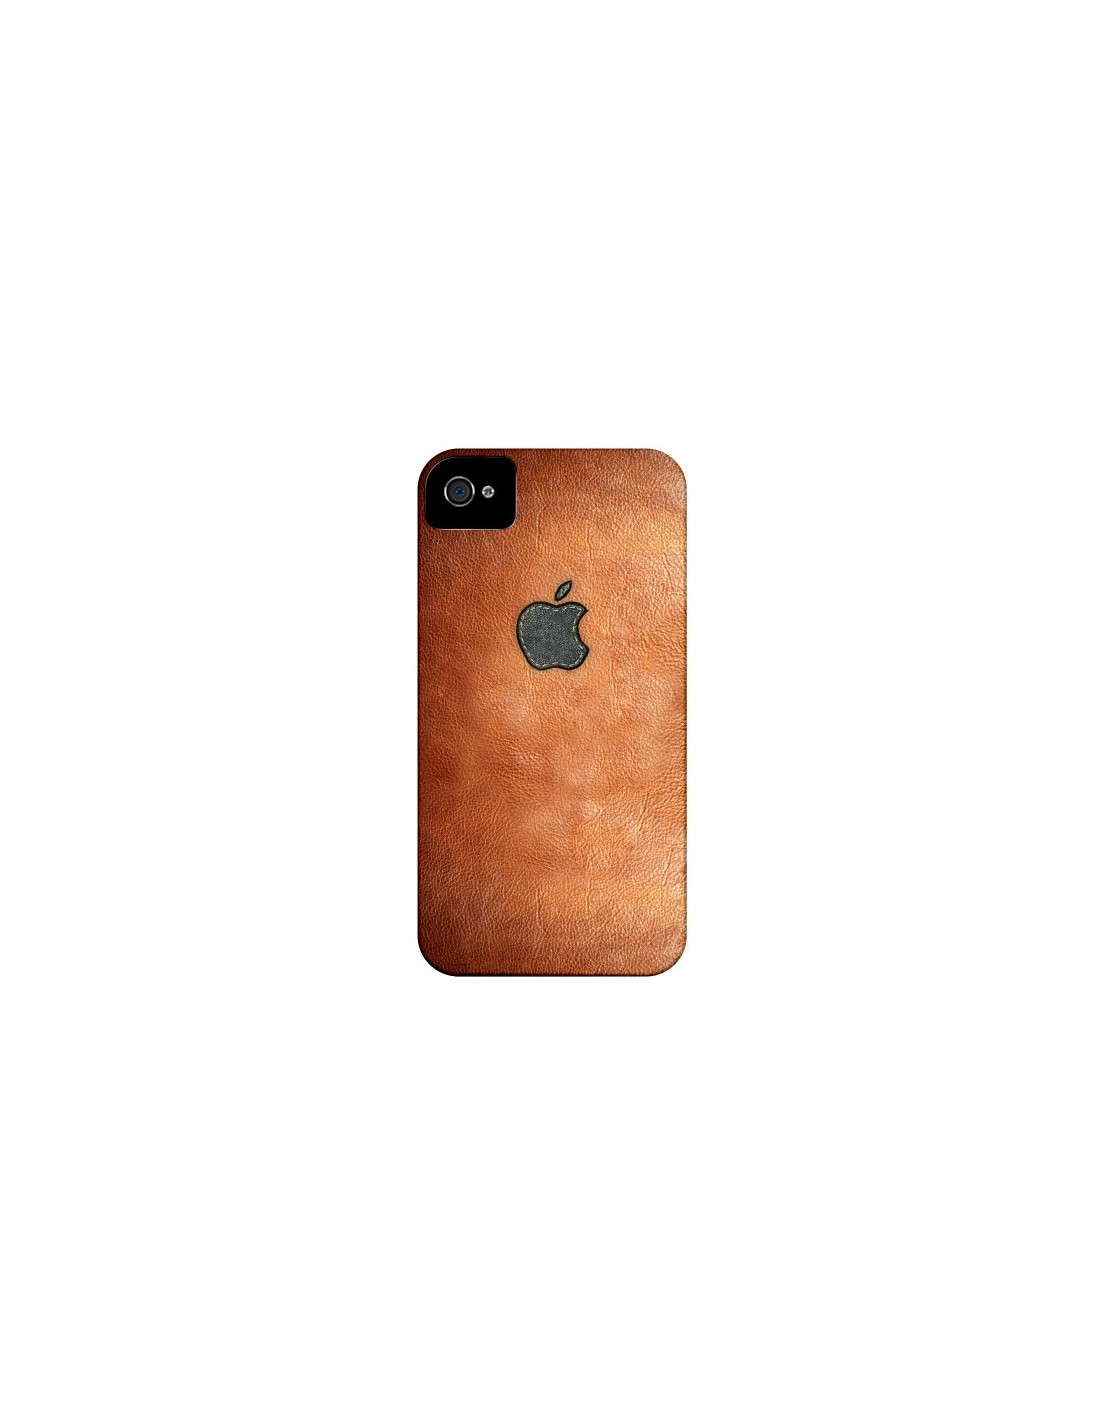 Coque iPhone 4 et 4S Style Cuir - Maximilian San